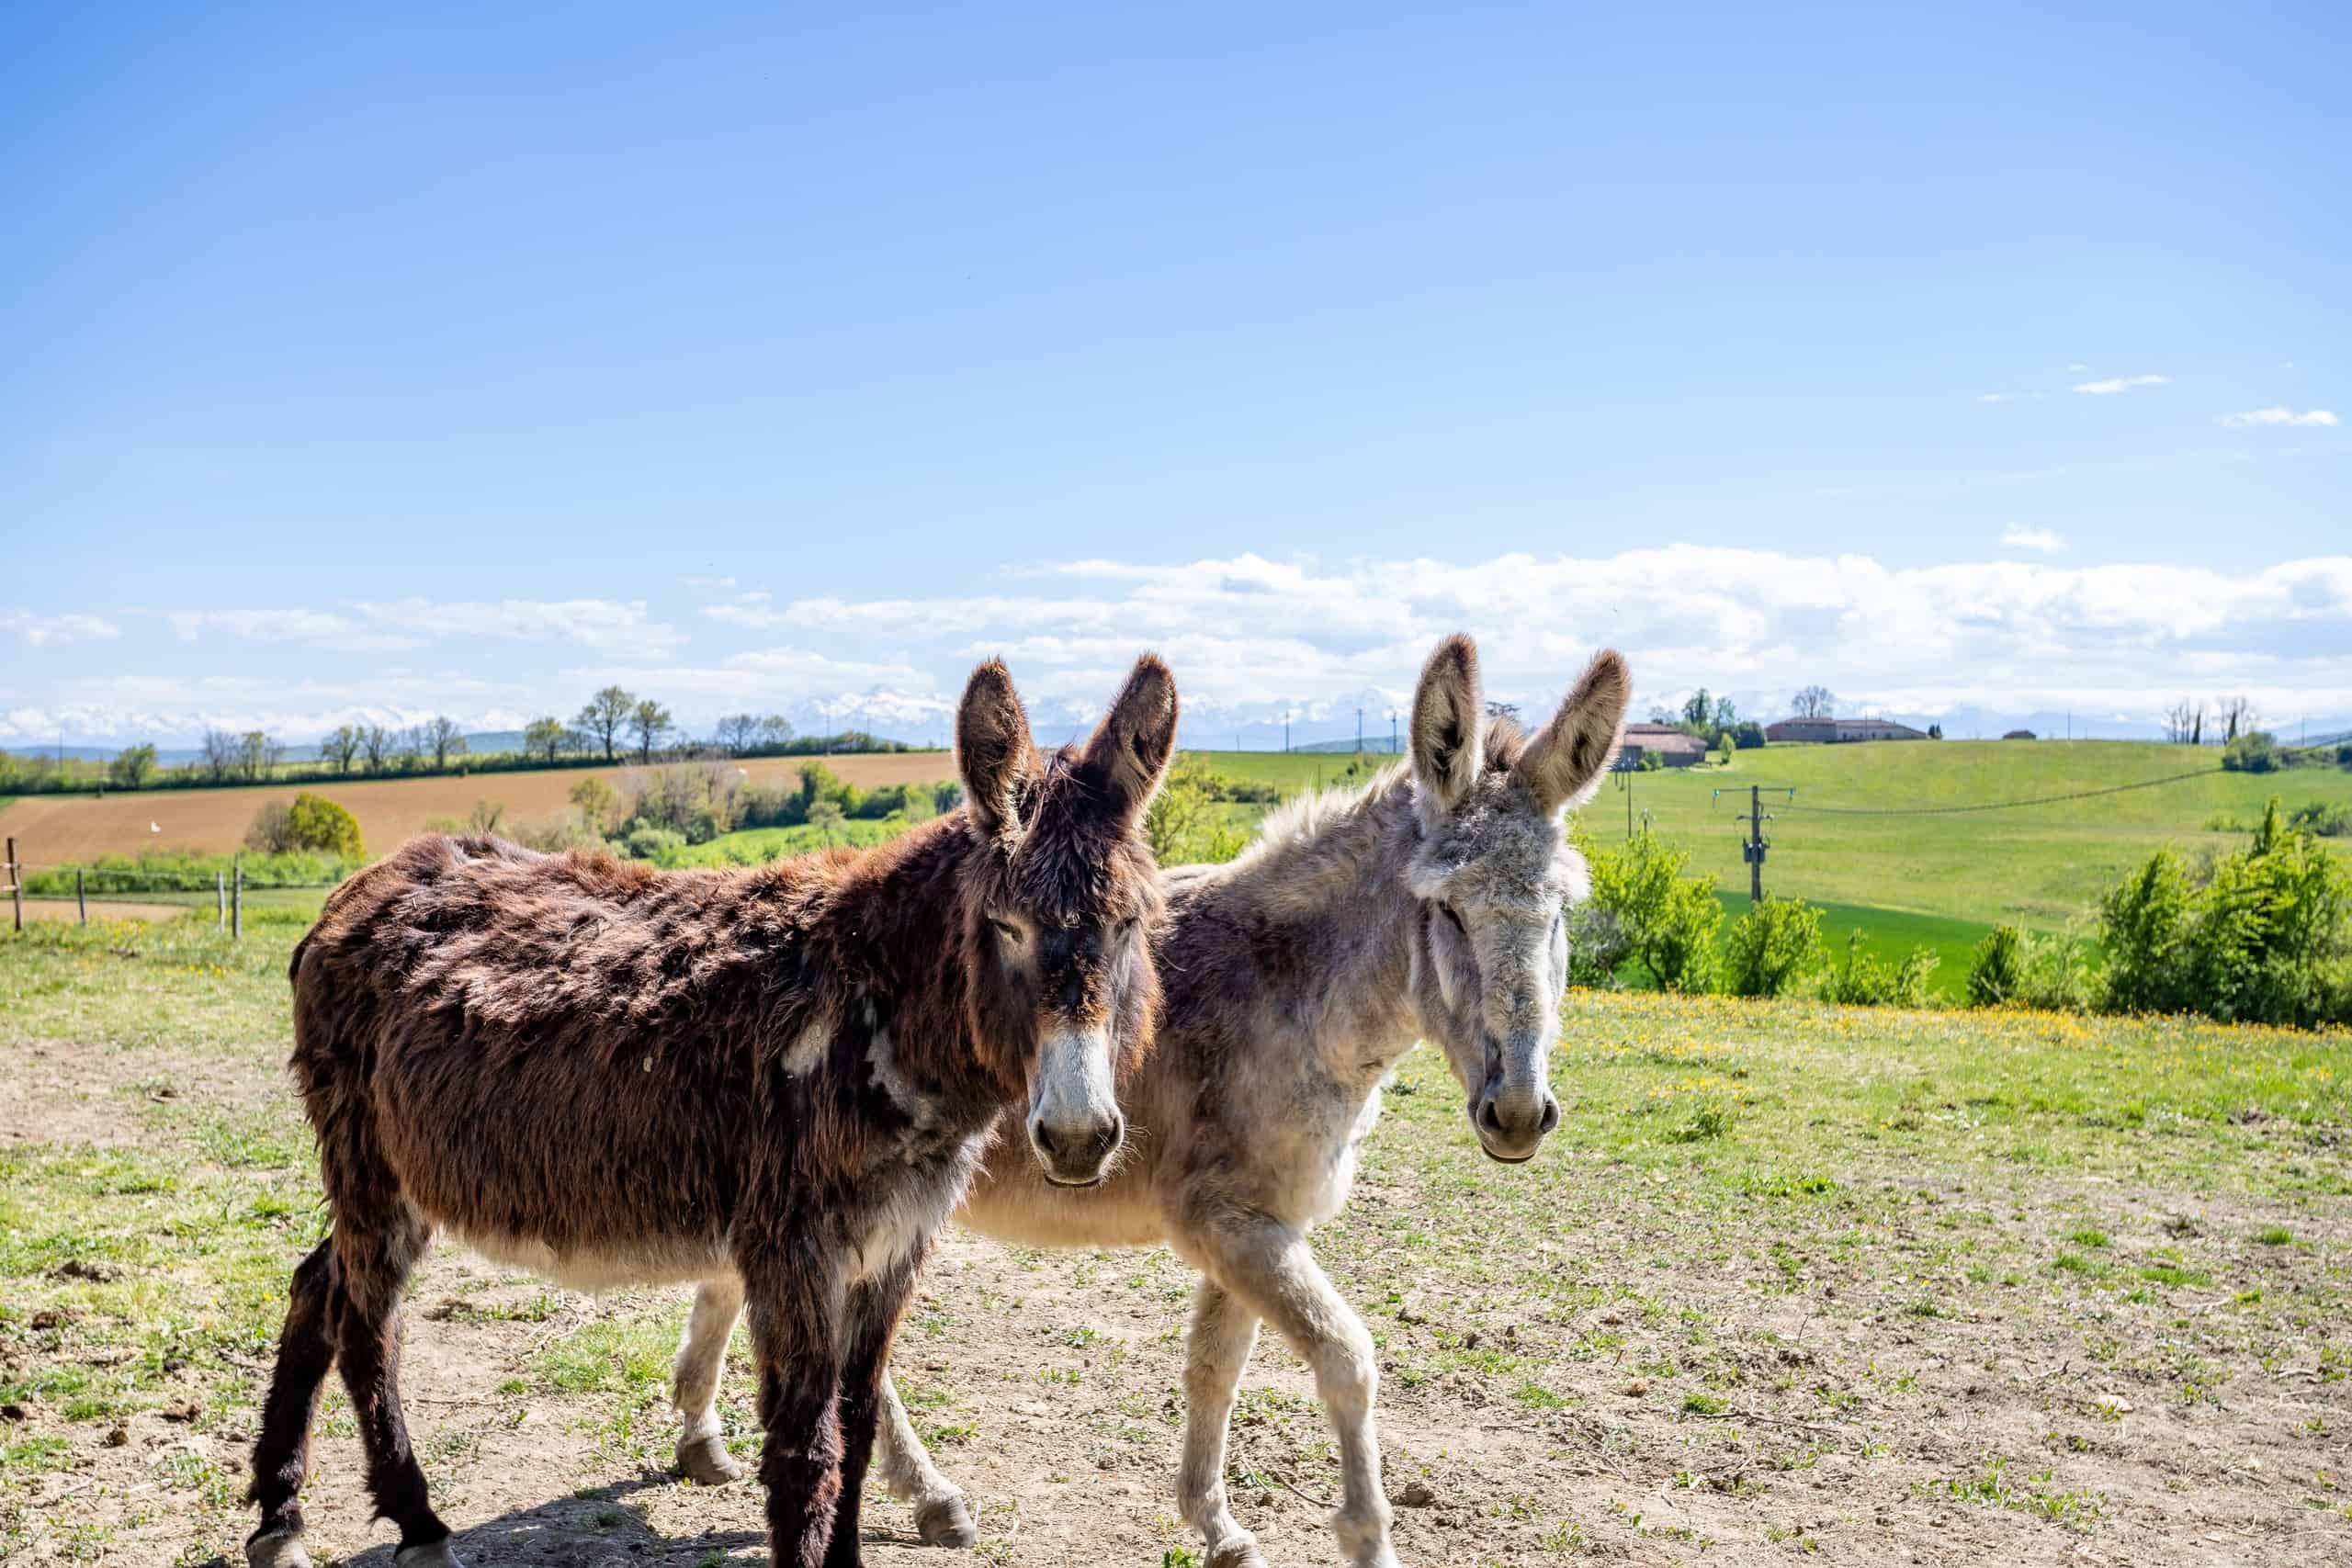 Donkeys-WMC070